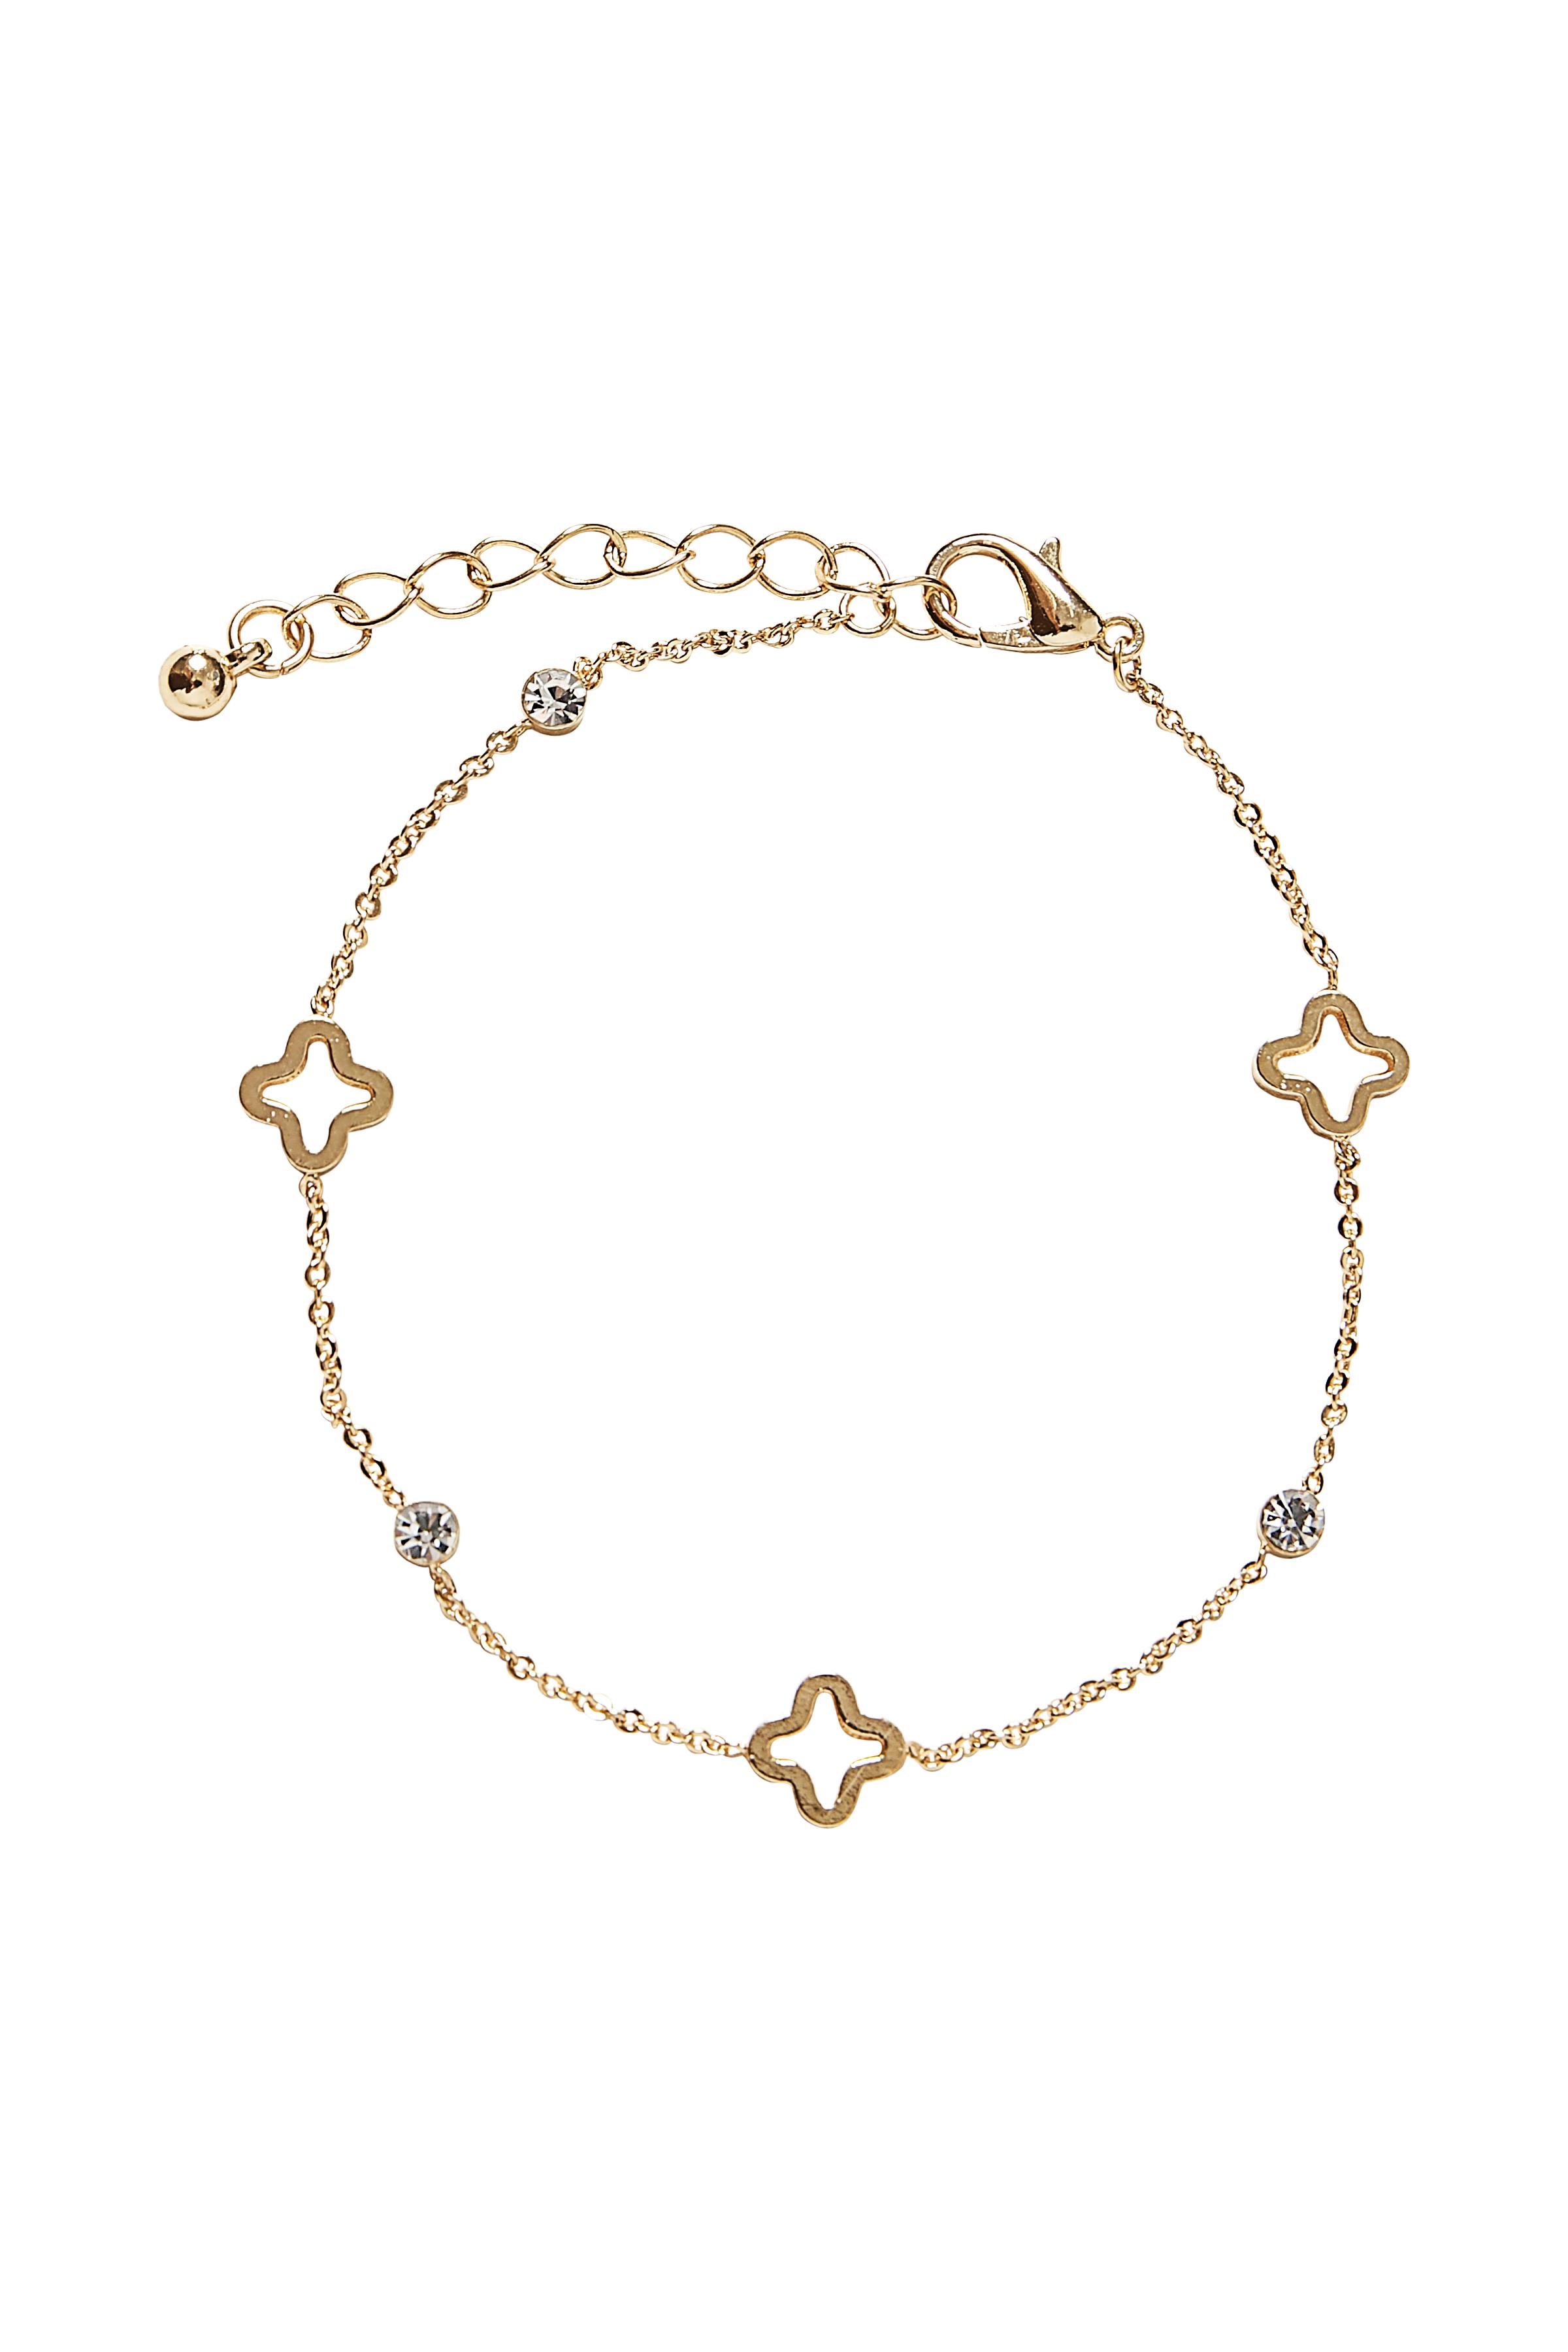 Gold Armband  von Fransa – Shoppen Sie Gold Armband  ab Gr. ONE hier